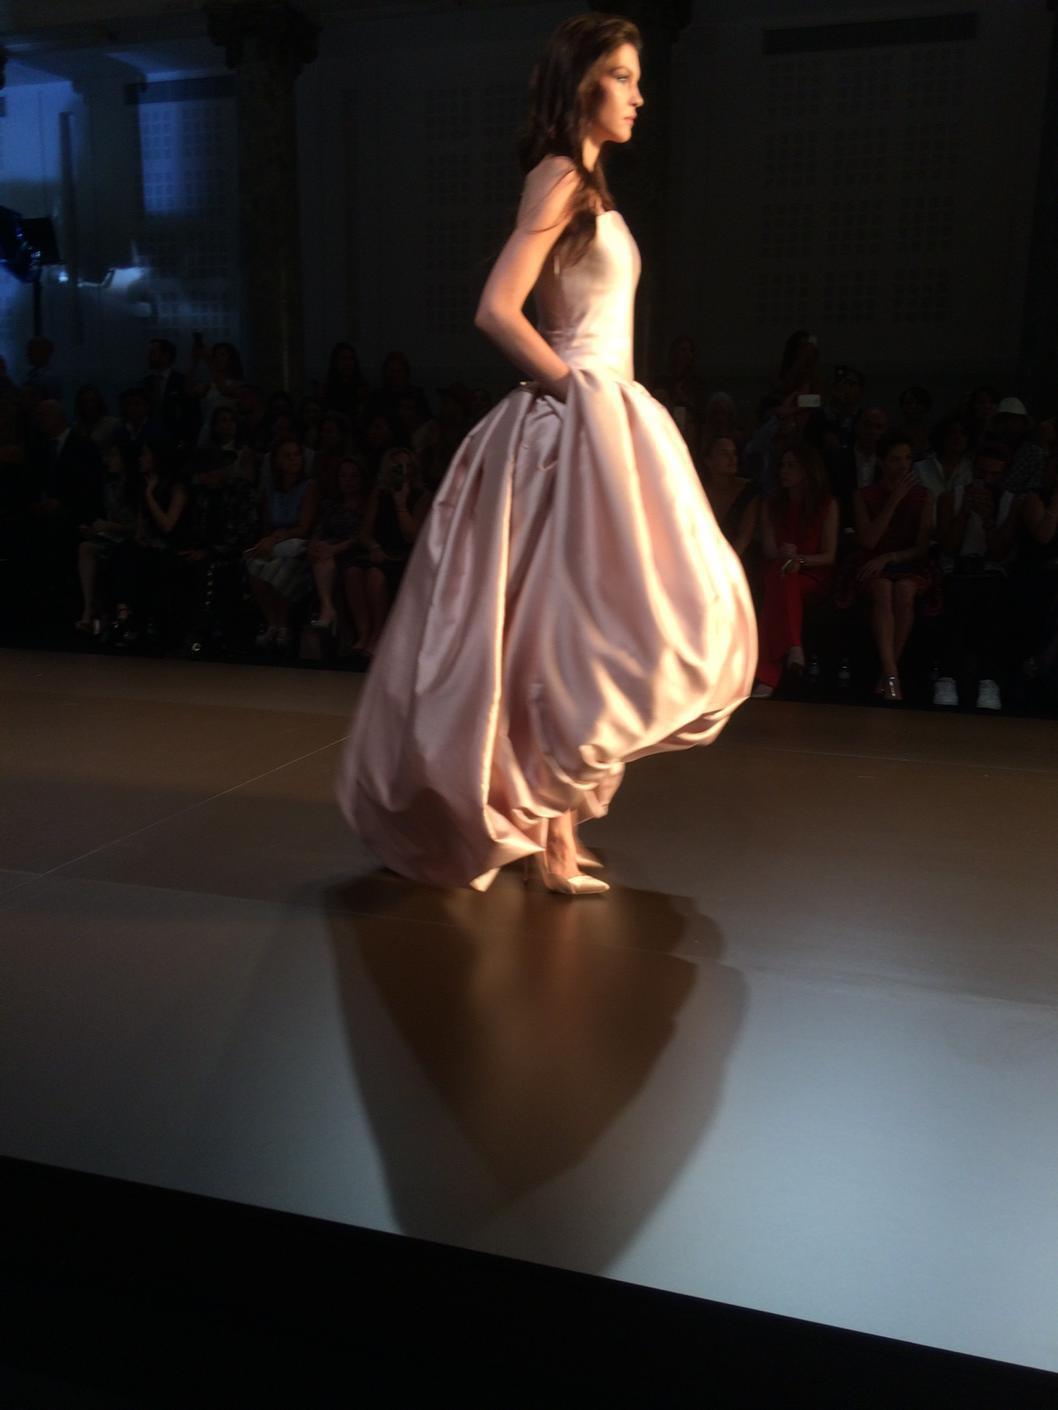 RT @VVFriedman: Bubble skirt at @Ralphandrusso #couture http://t.co/gaThNHbP8r